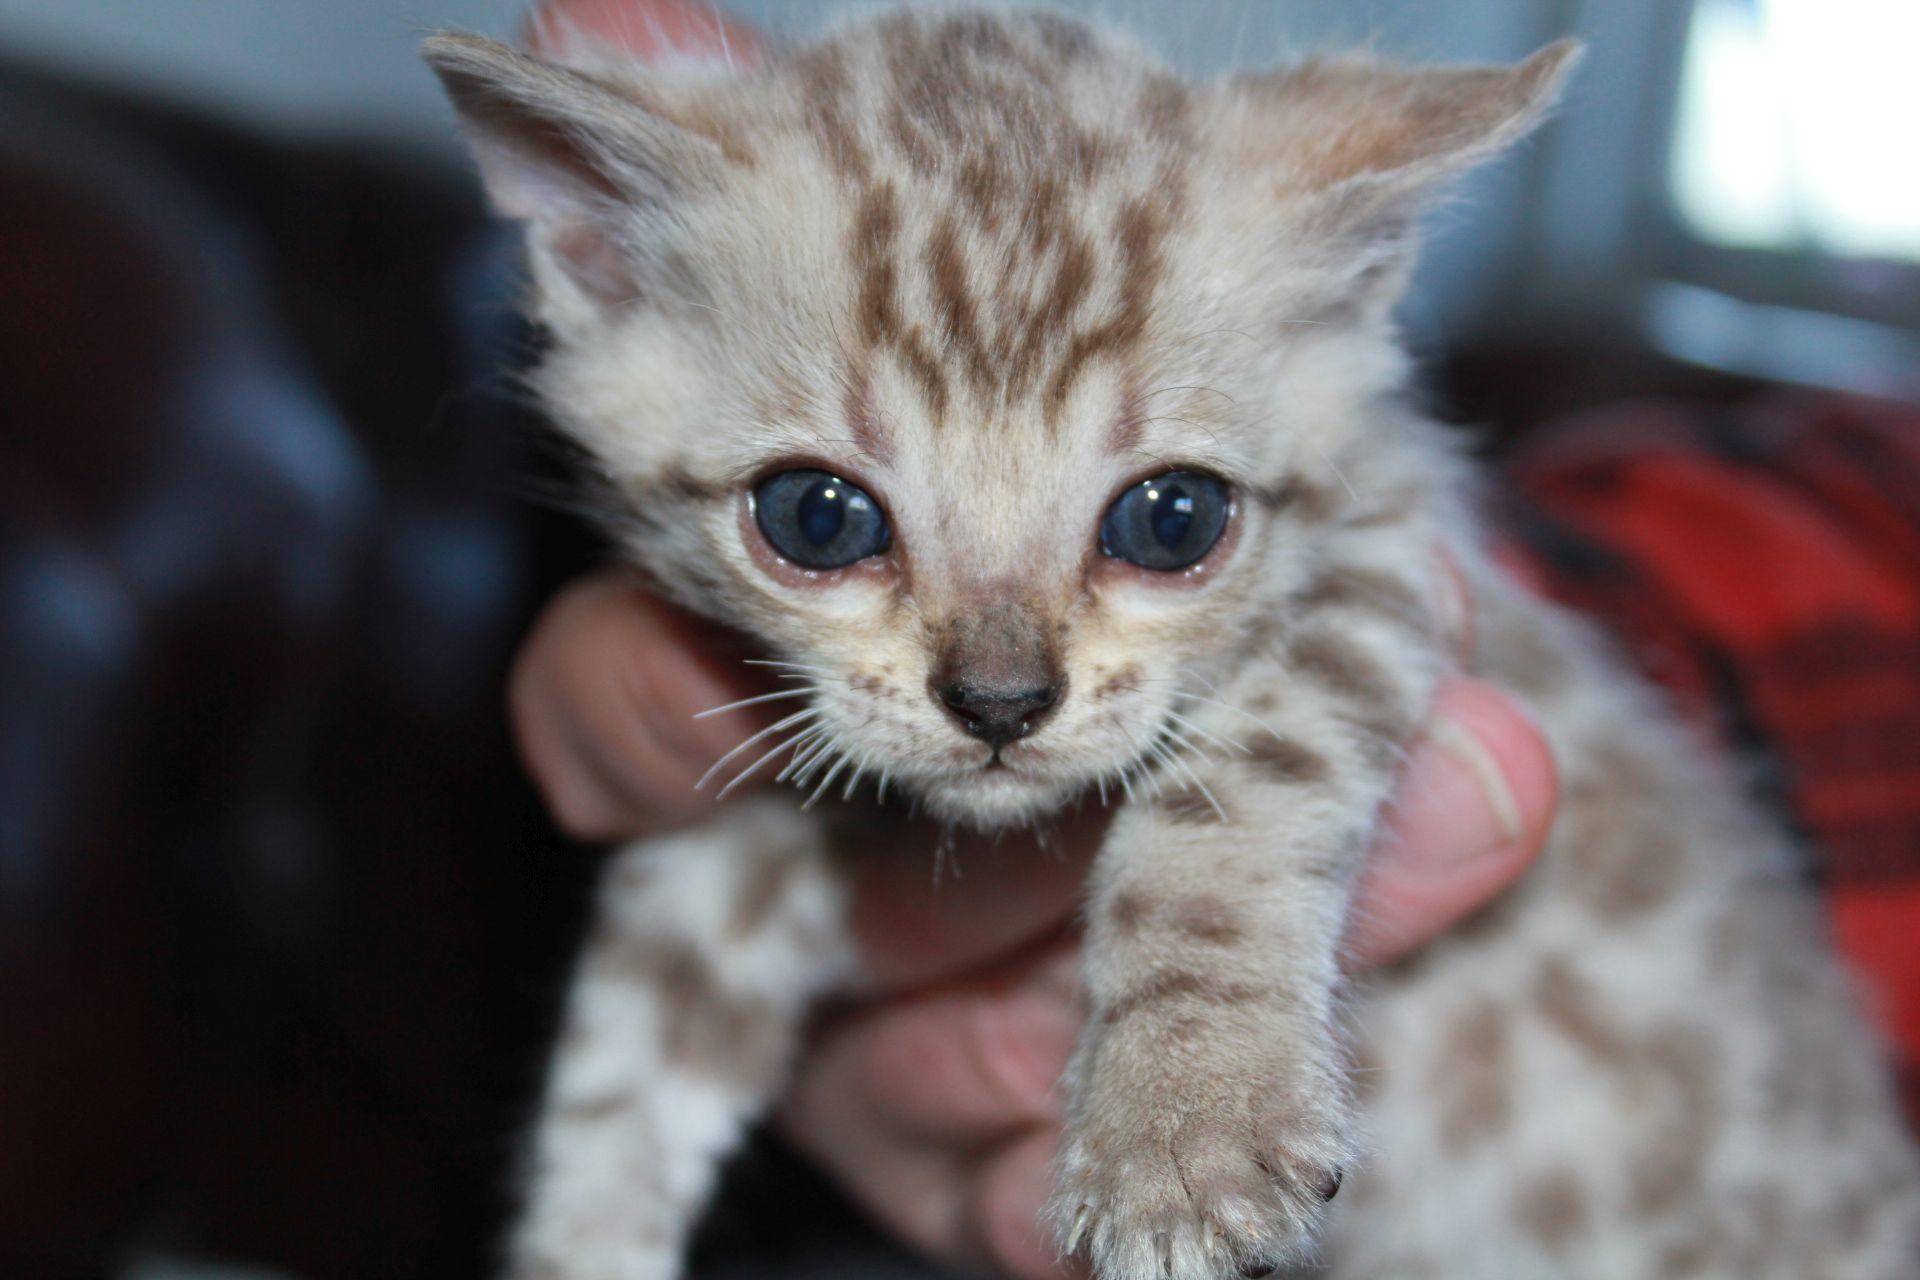 Photo 2 of el-capitan the Bengal kitten.